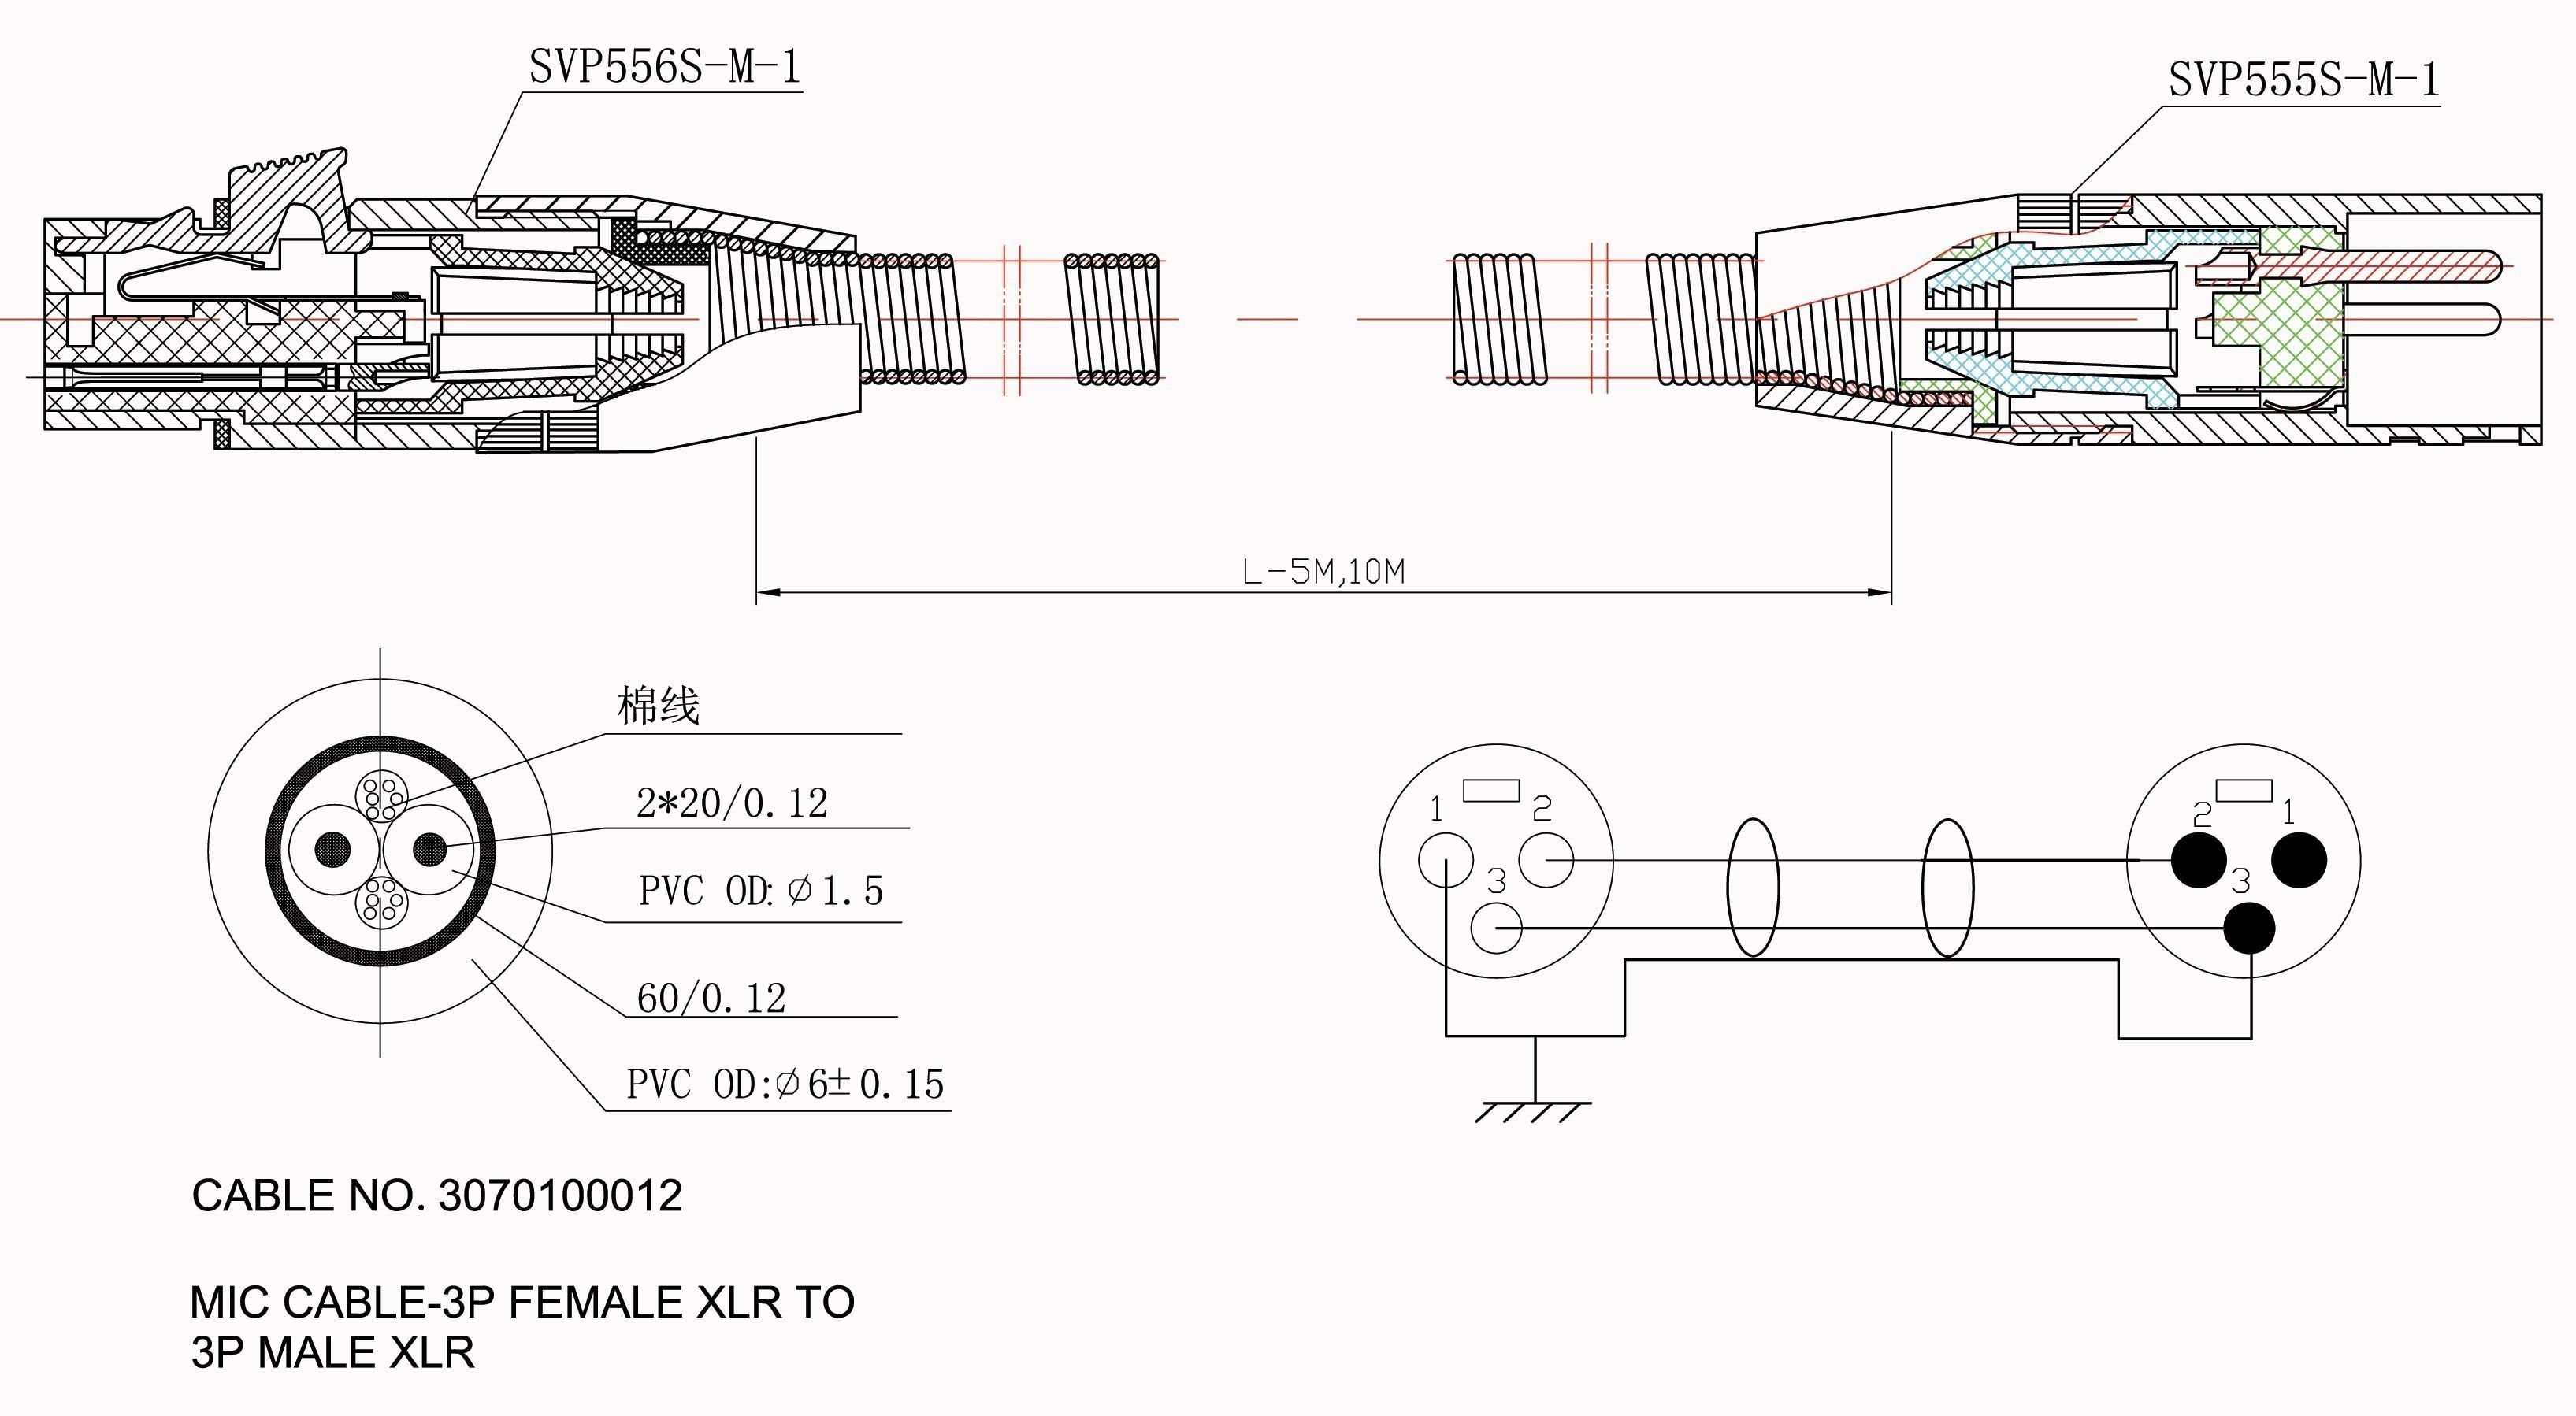 Baja Designs Wiring Diagram Rc 10 Wiring Diagram Wiring Diagram Strategy Design Plan • Of Baja Designs Wiring Diagram